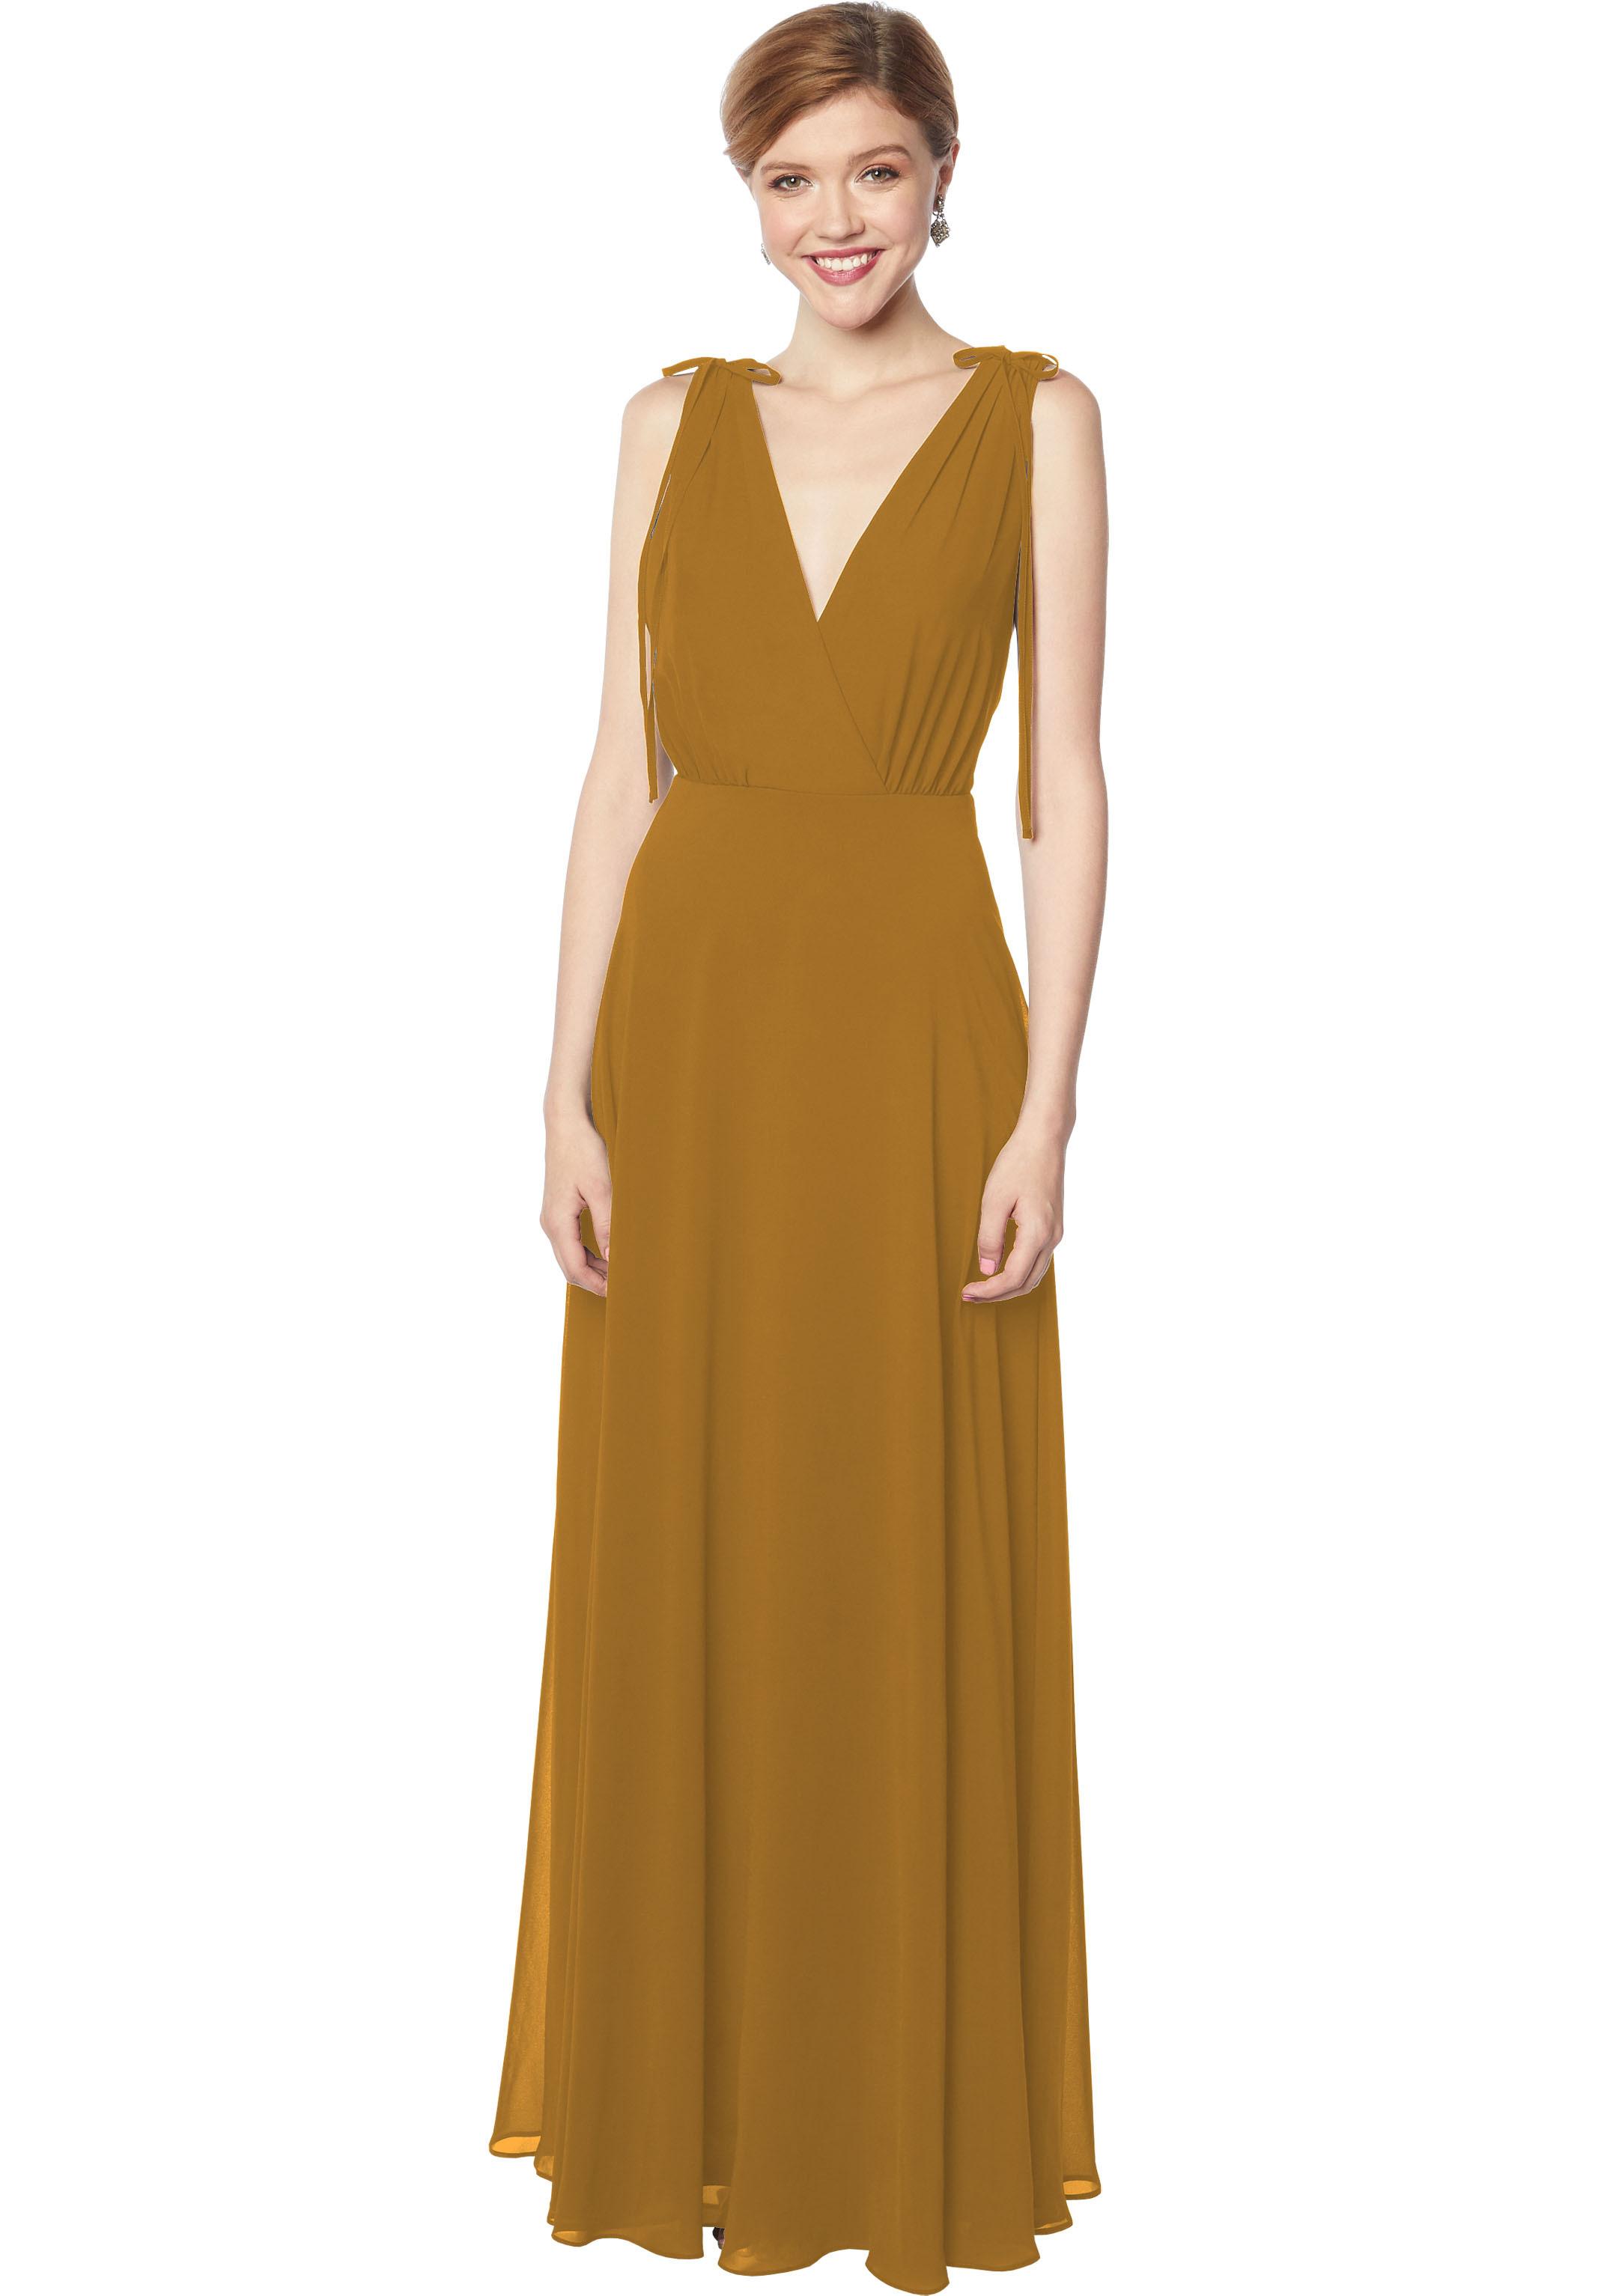 Bill Levkoff GOLD Chiffon Sleeveless A-line gown, $178.00 Front